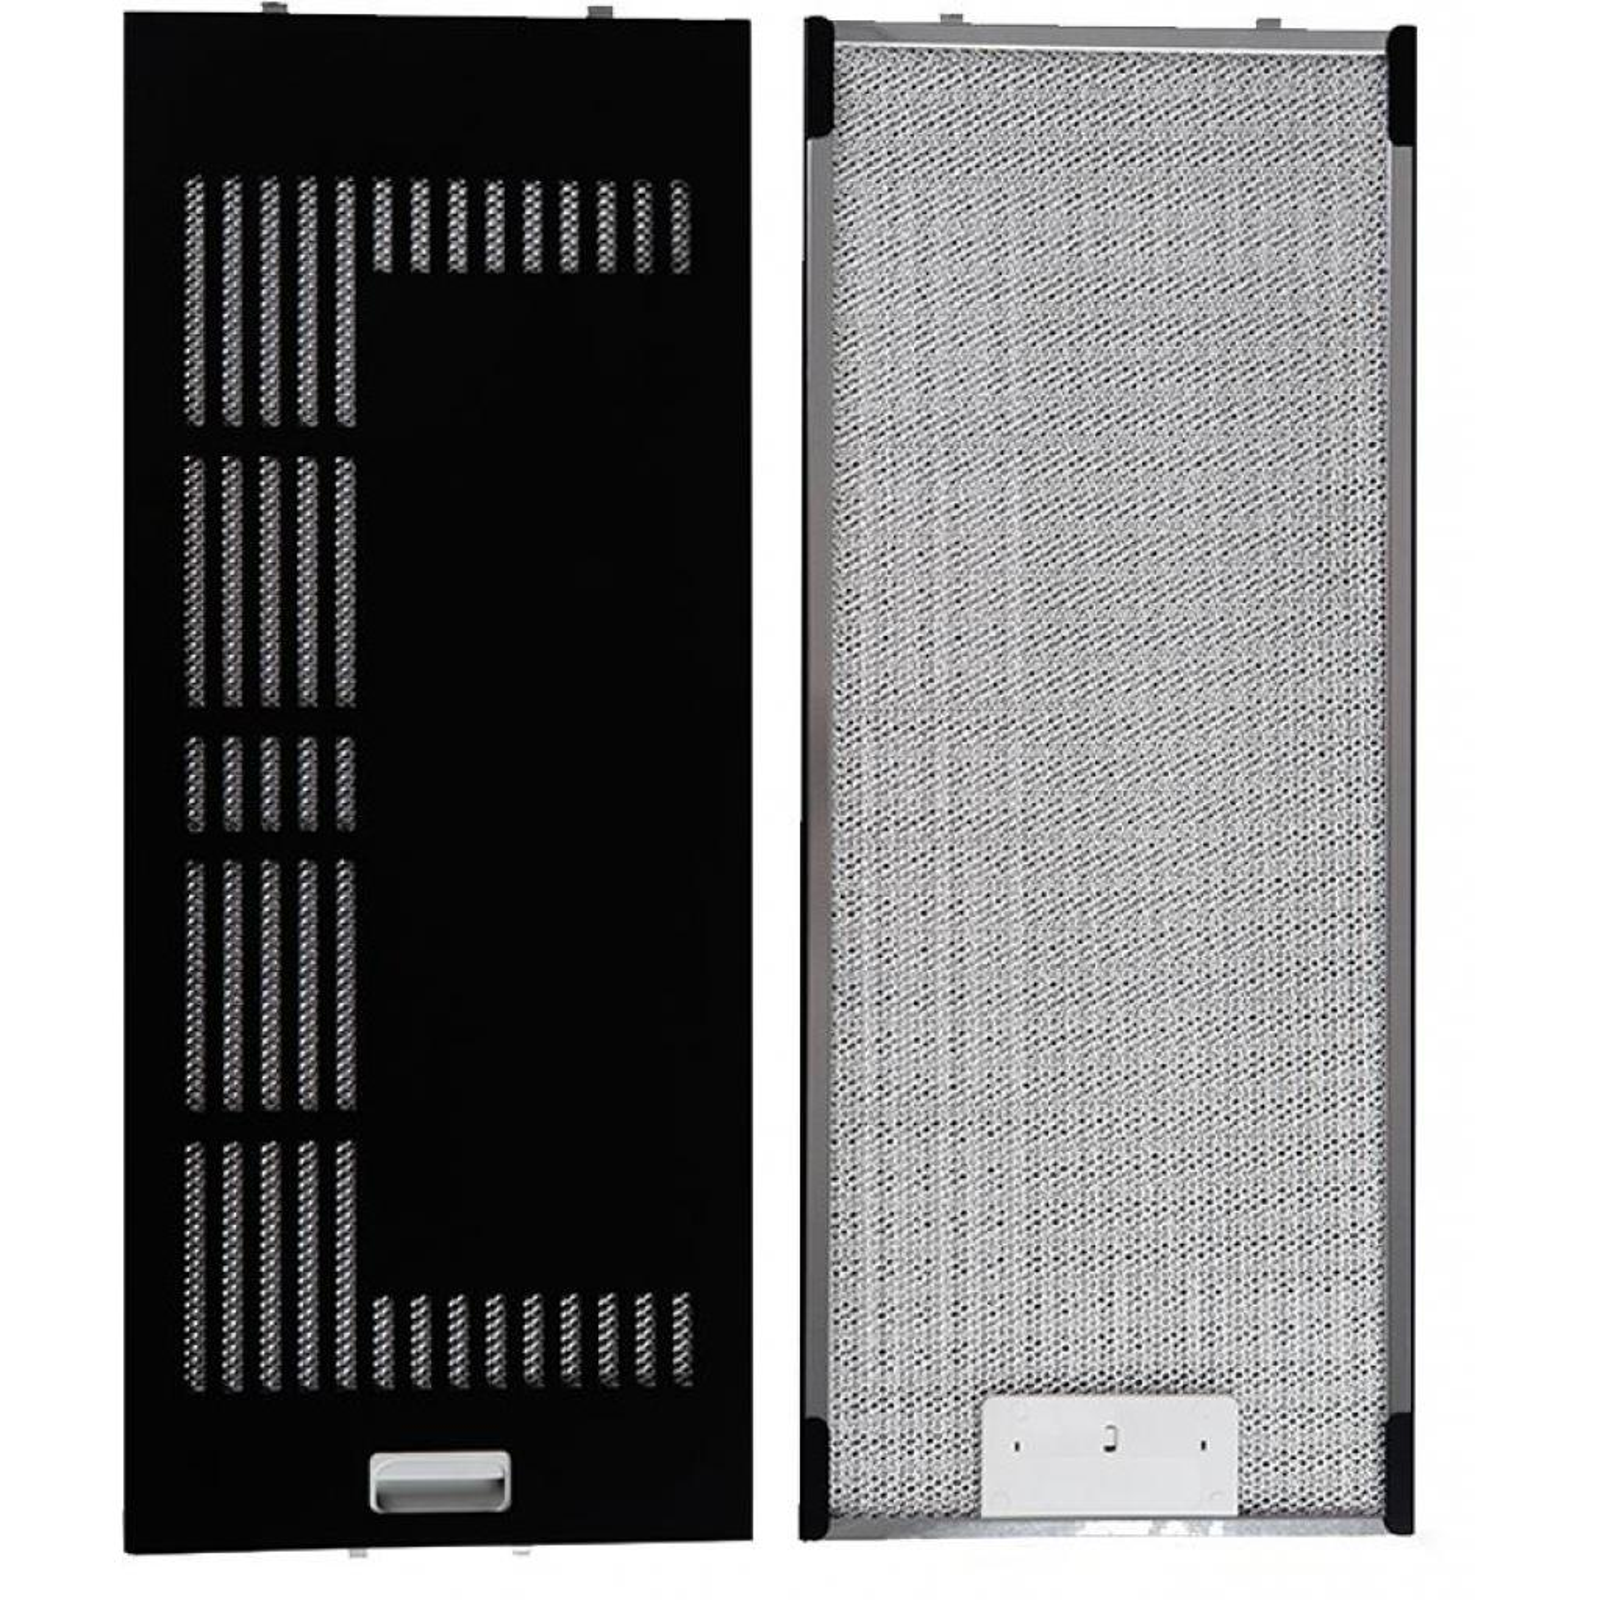 Вытяжка кухонная PERFELLI TLS 6833 BL LED Strip изображение 8